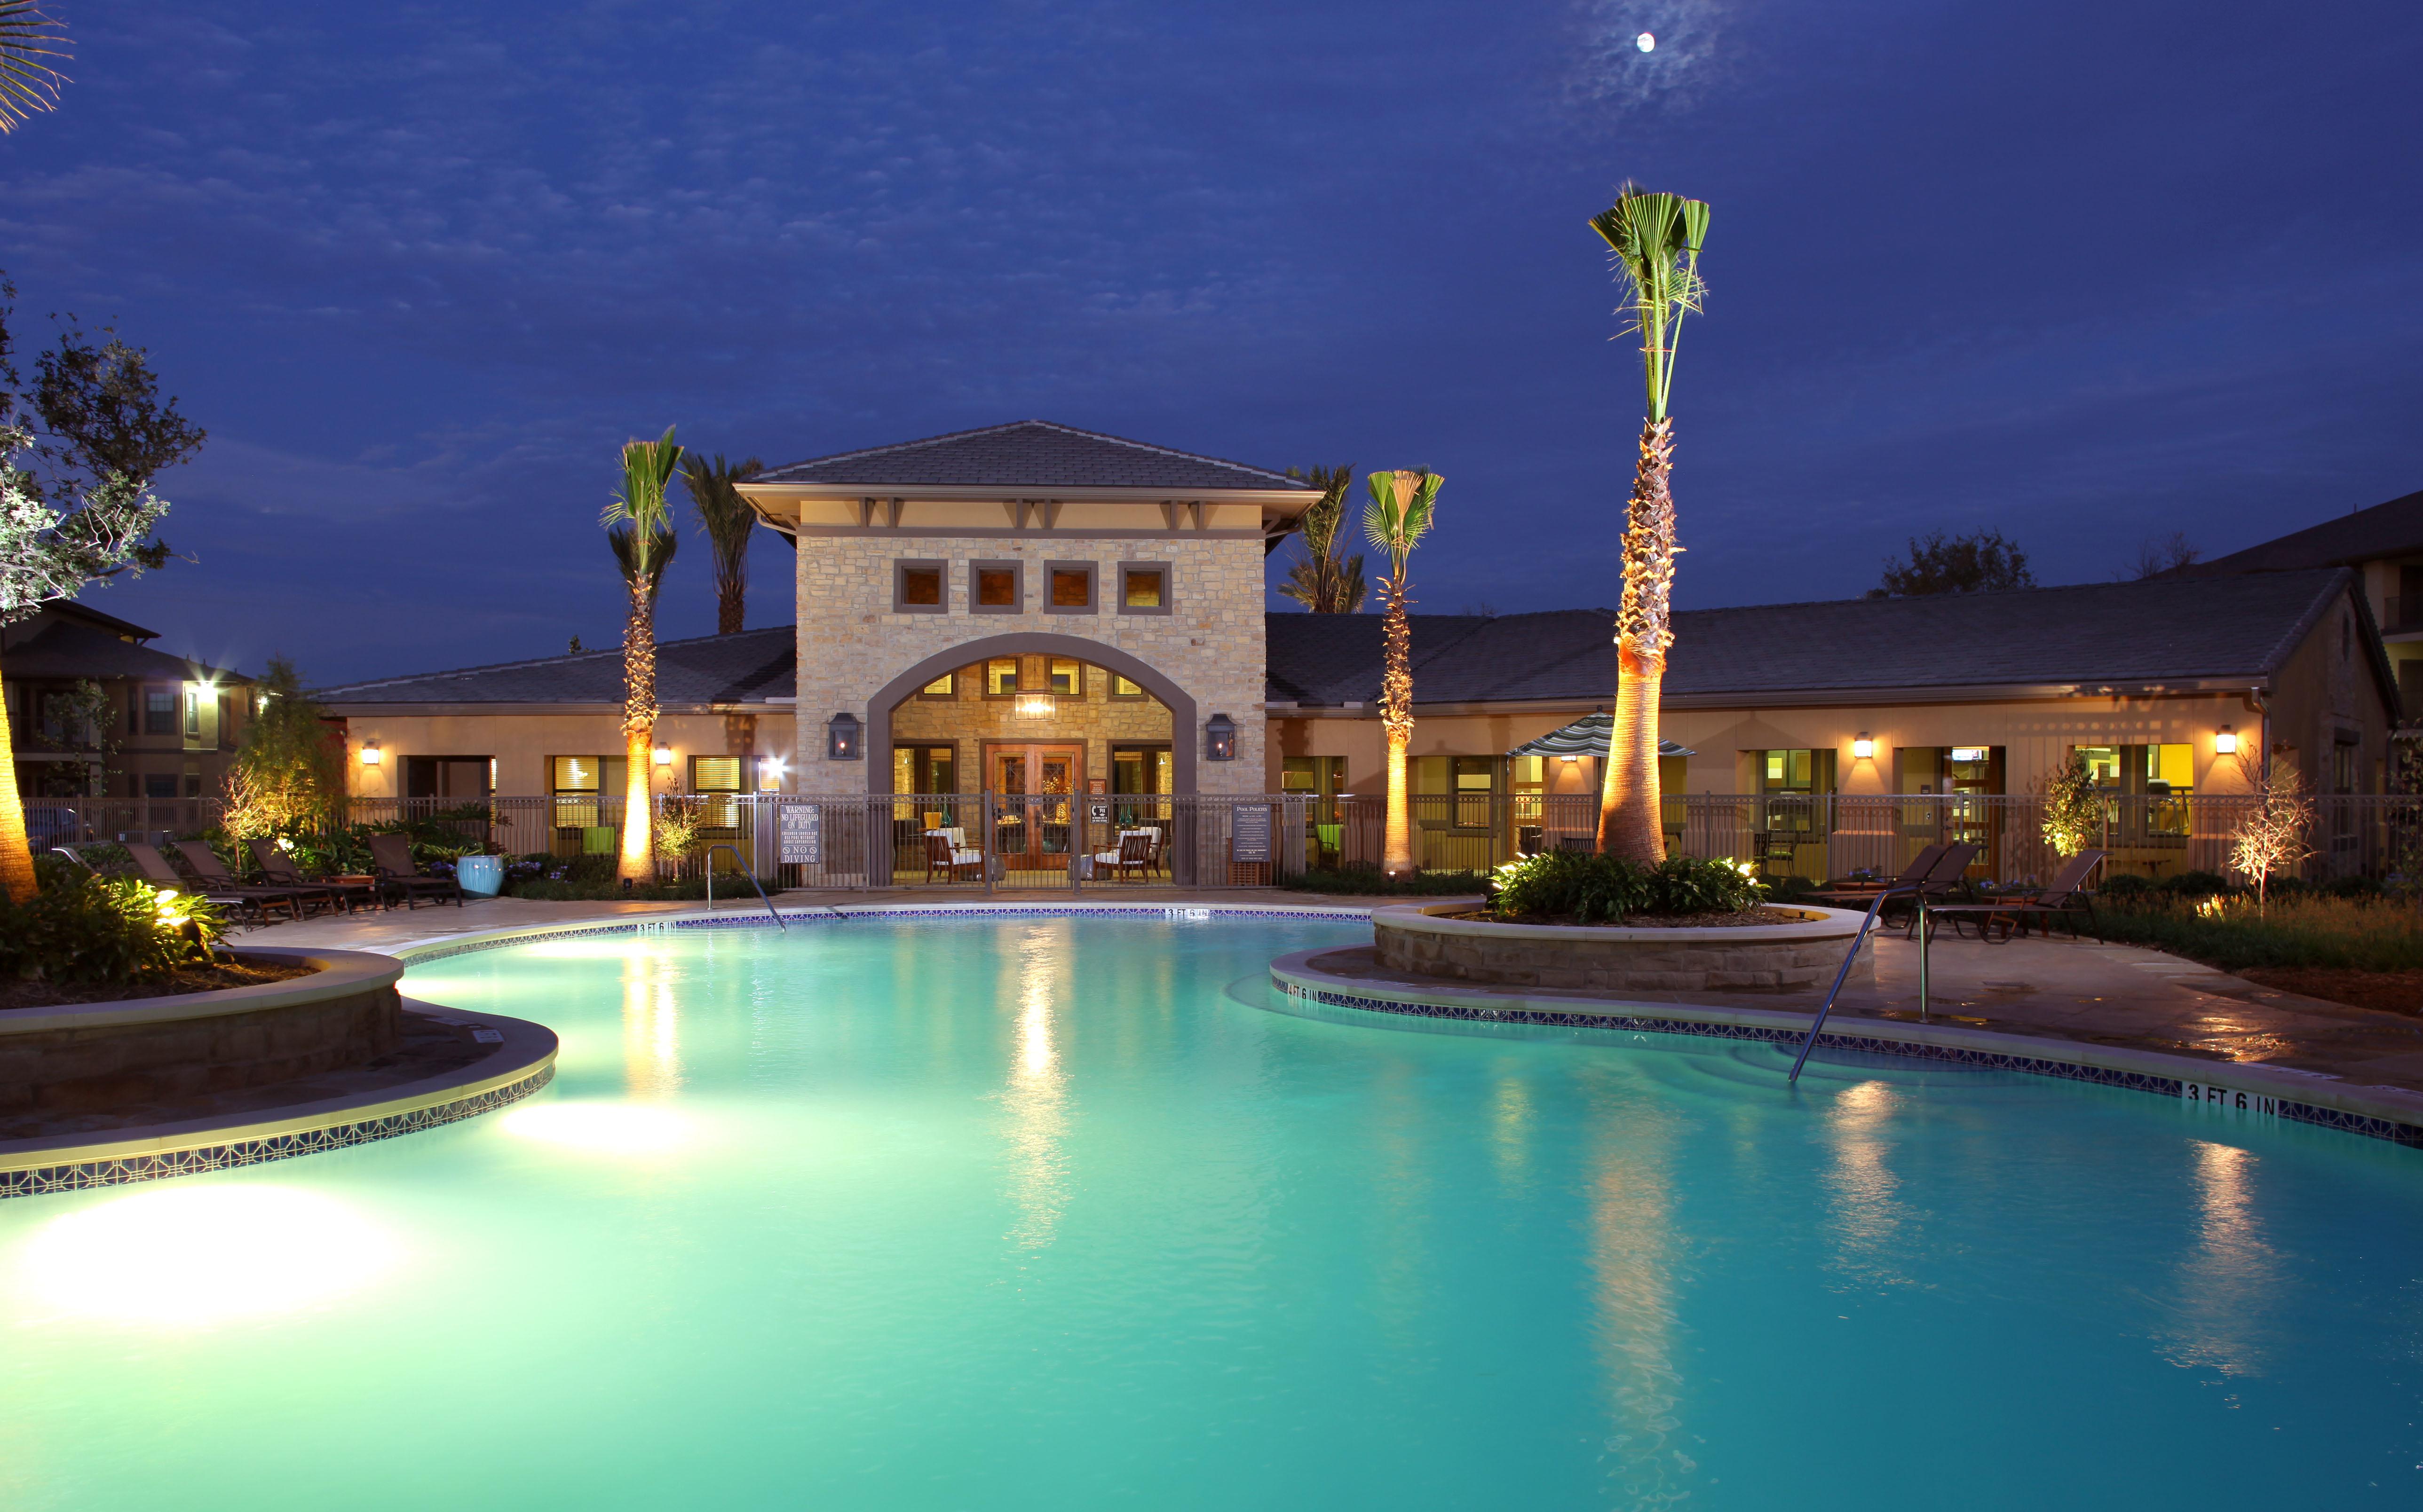 Palomino Apartments In San Antonio Tx San Antonio Texas